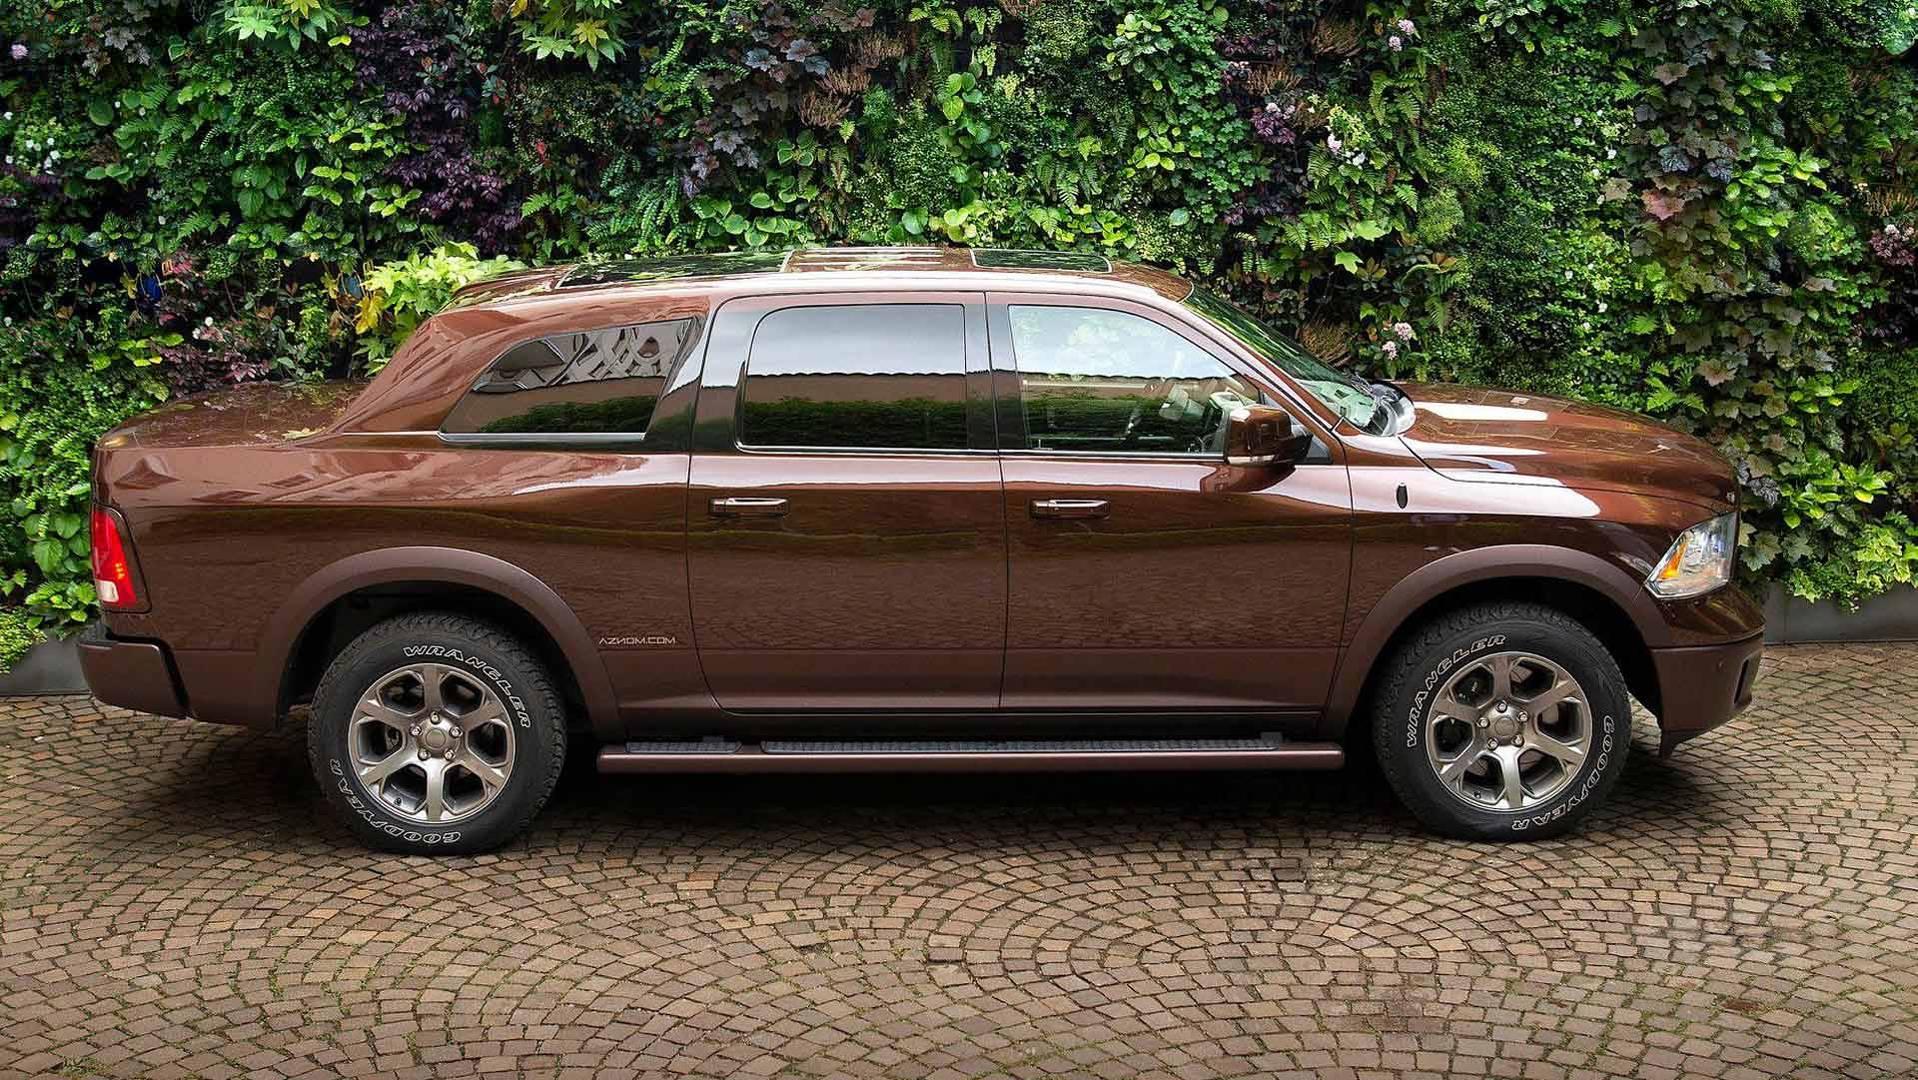 Italian Shop Transforms Ram 1500 Into Ultra-Opulent SUV